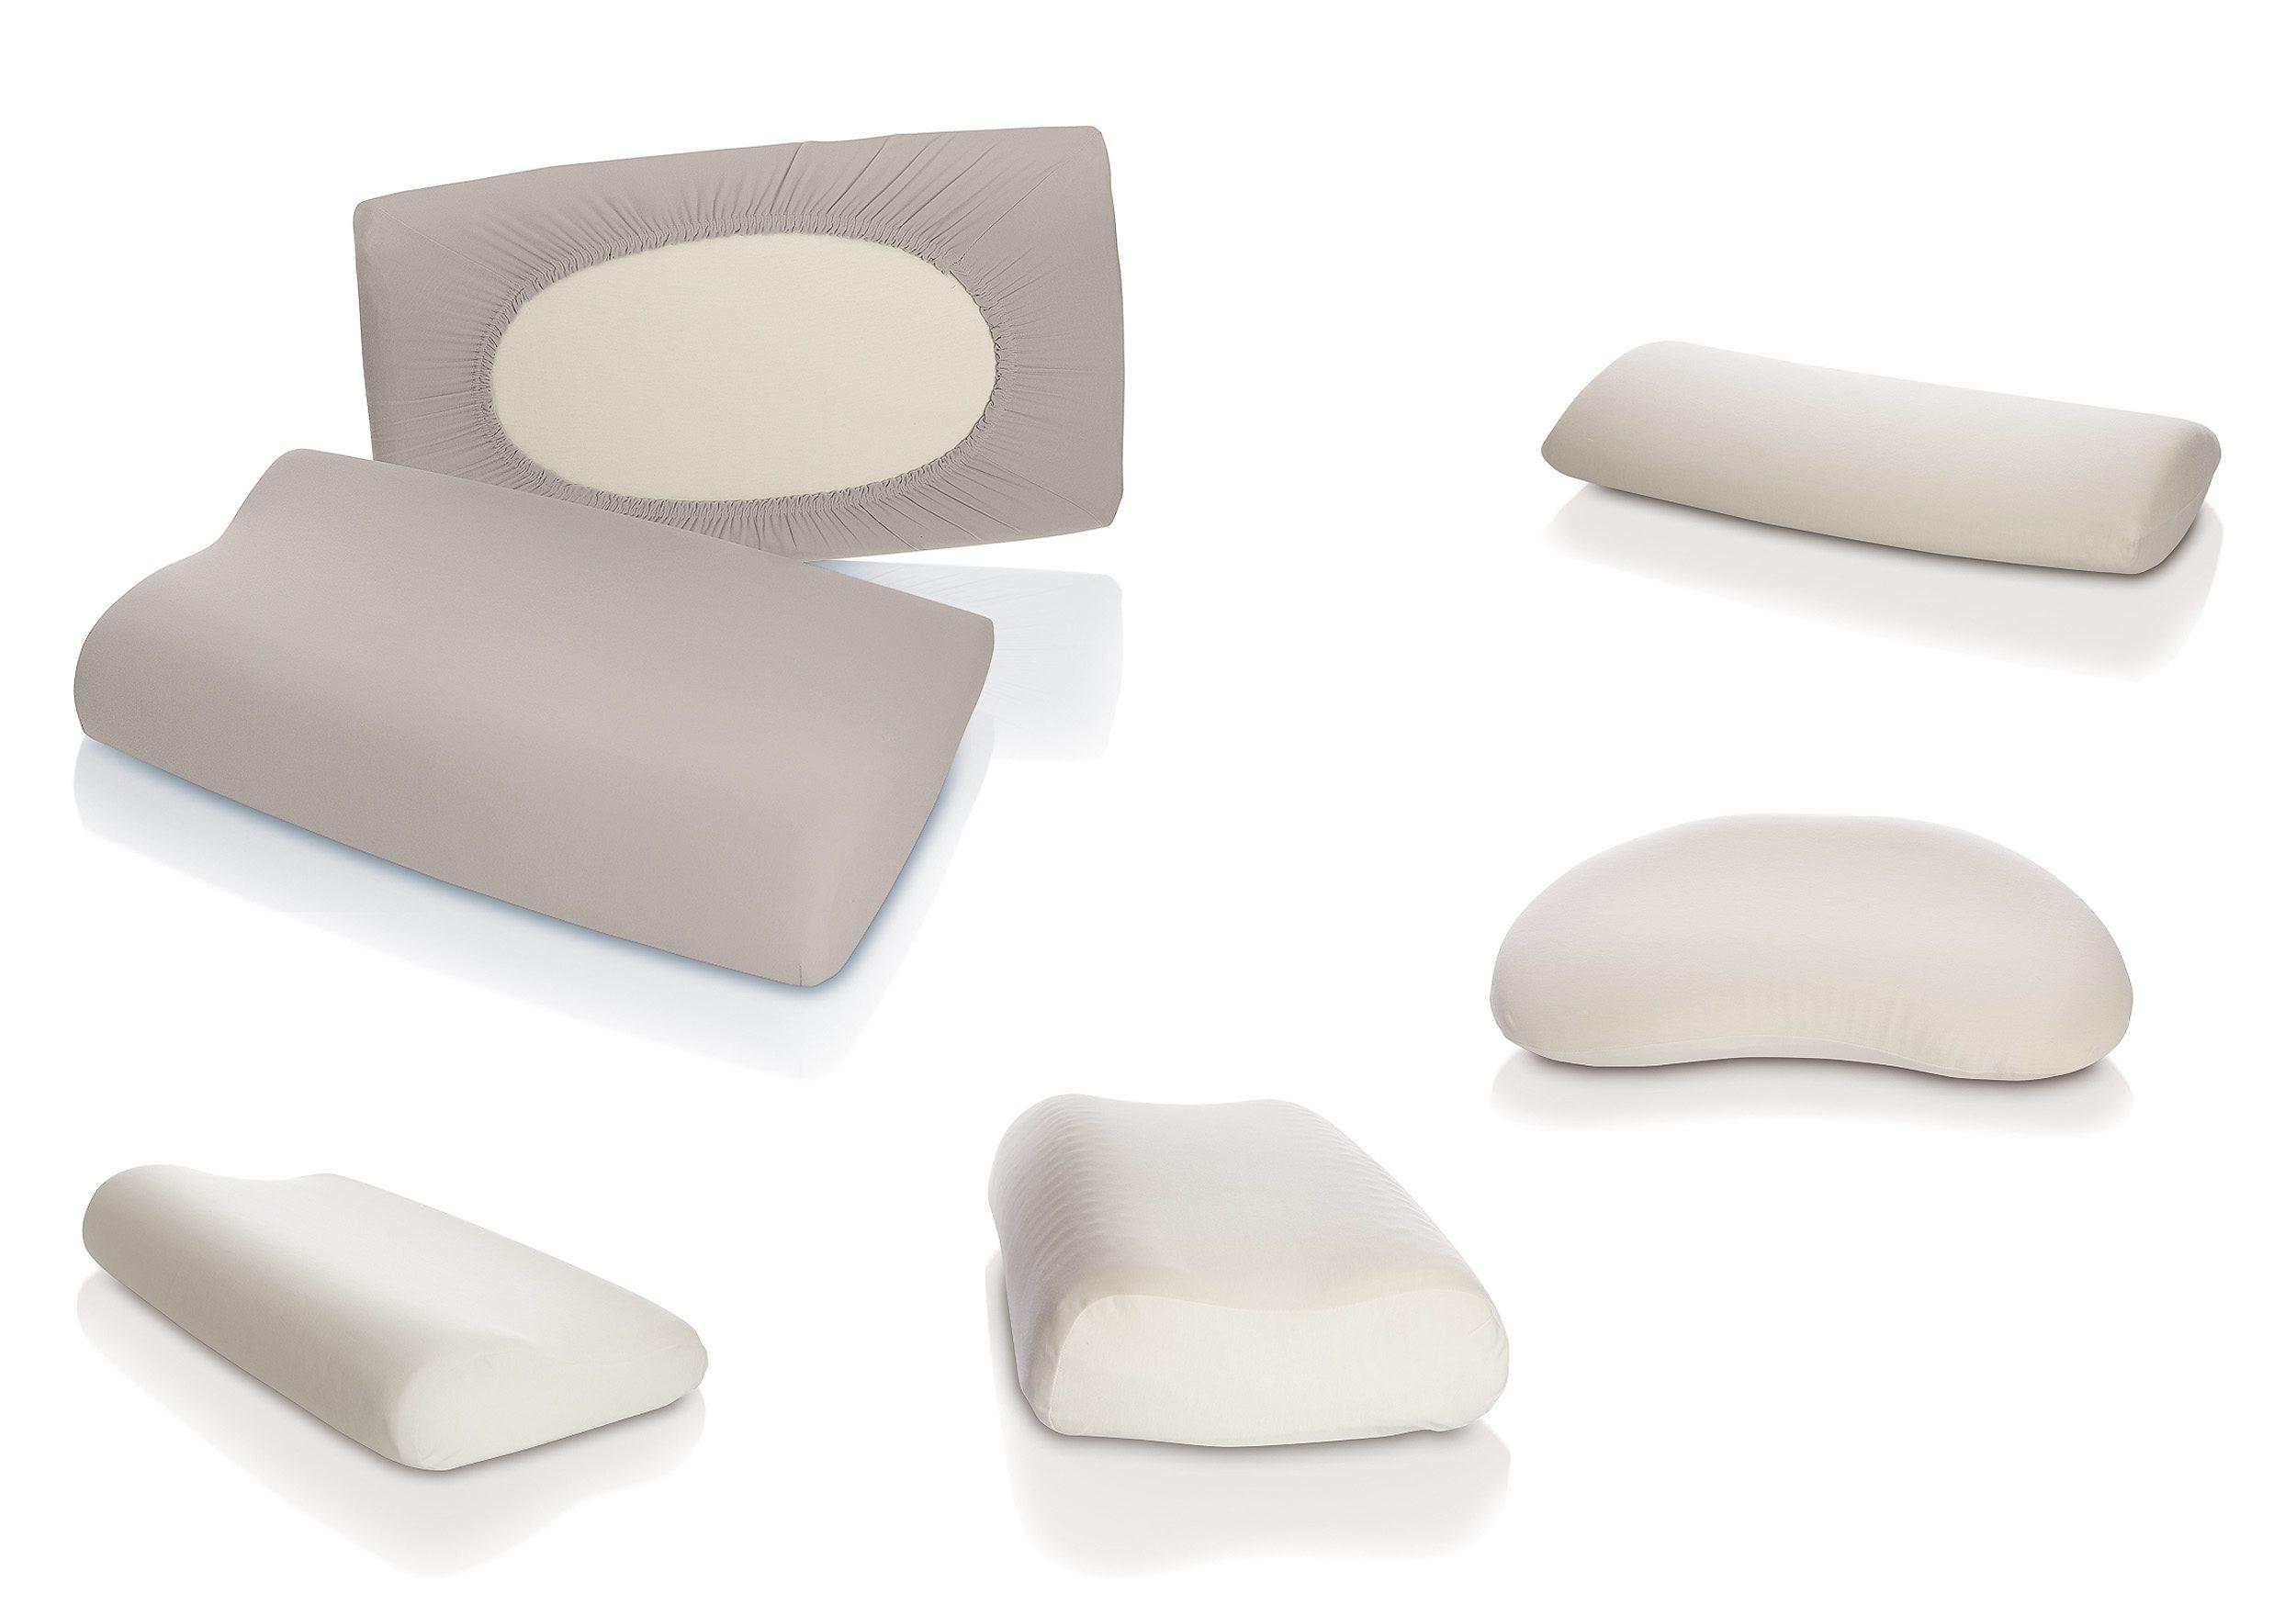 Kissenbezug Schlafgut Nackenstützkissen Schlafgut | Schlafzimmer > Kopfkissen > Nackenstützkissen & Nackenrollen | Grau | Baumwolle | Schlafgut